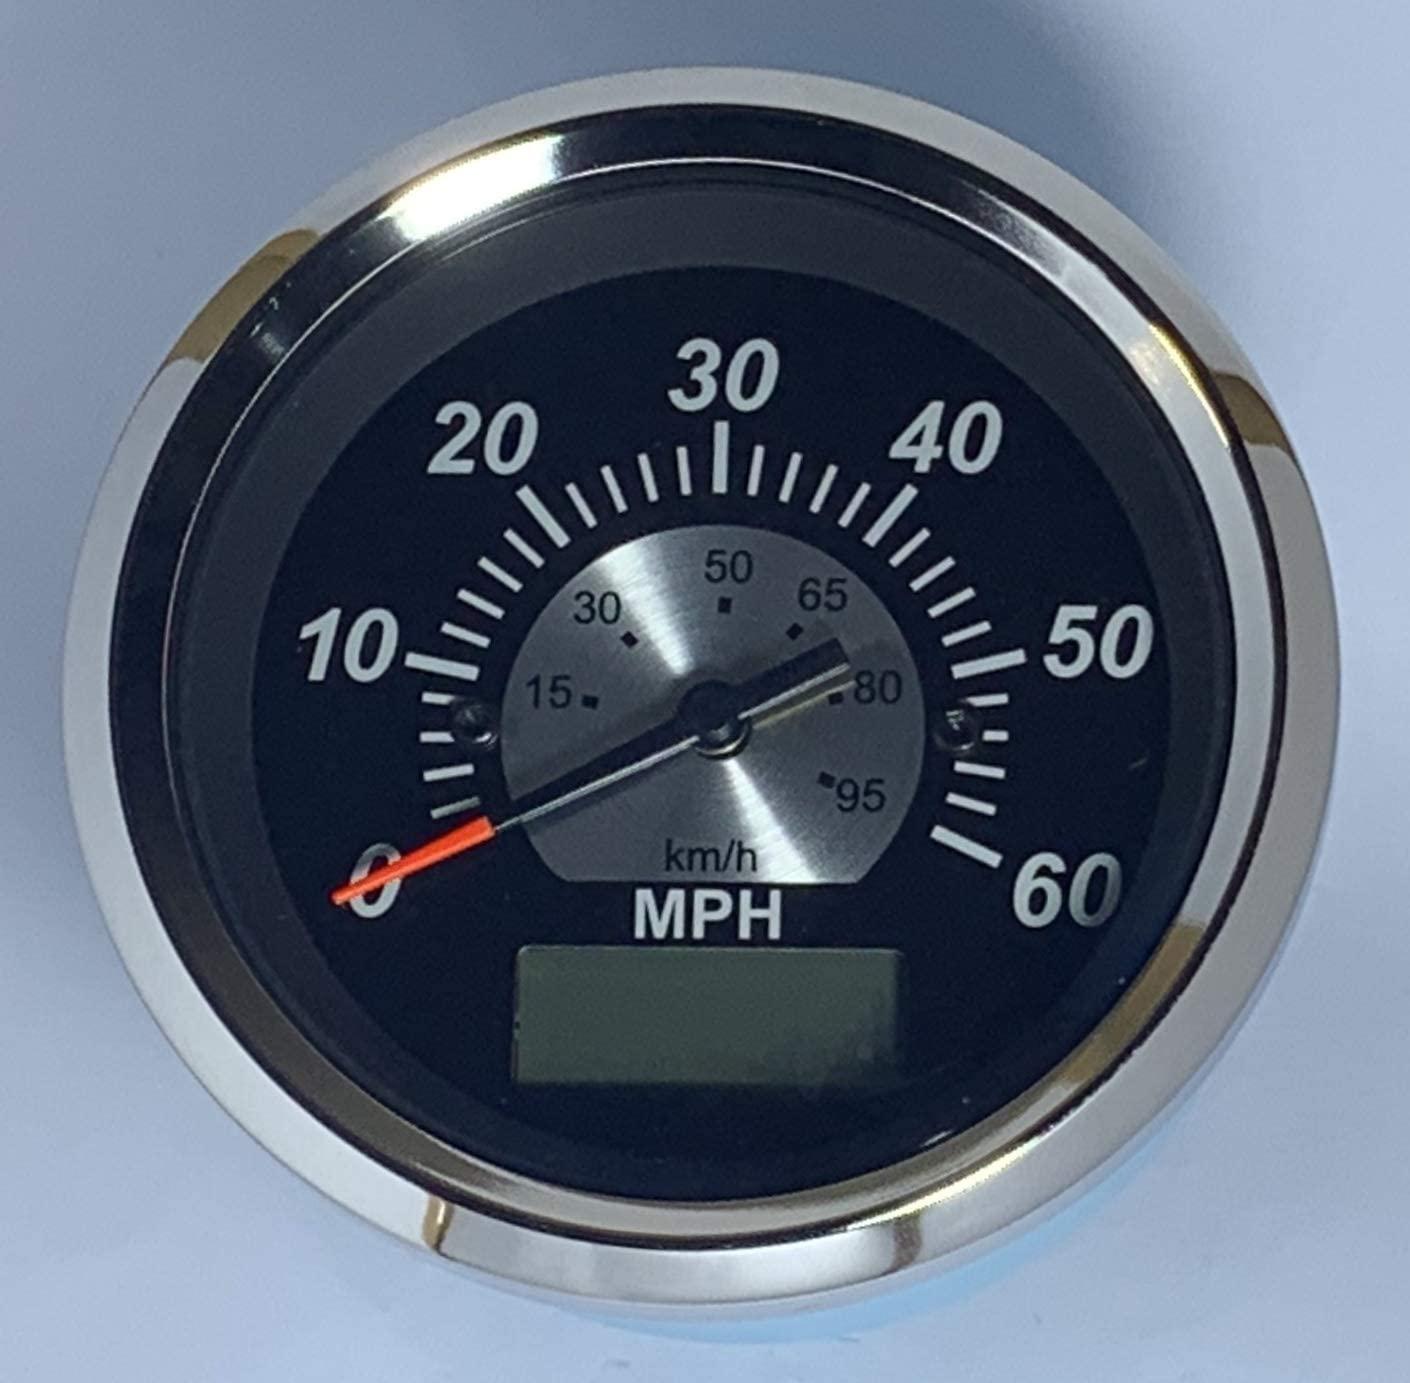 GPS Speedometer 60 MPH (Black Sterling) with GPS Speed sensor